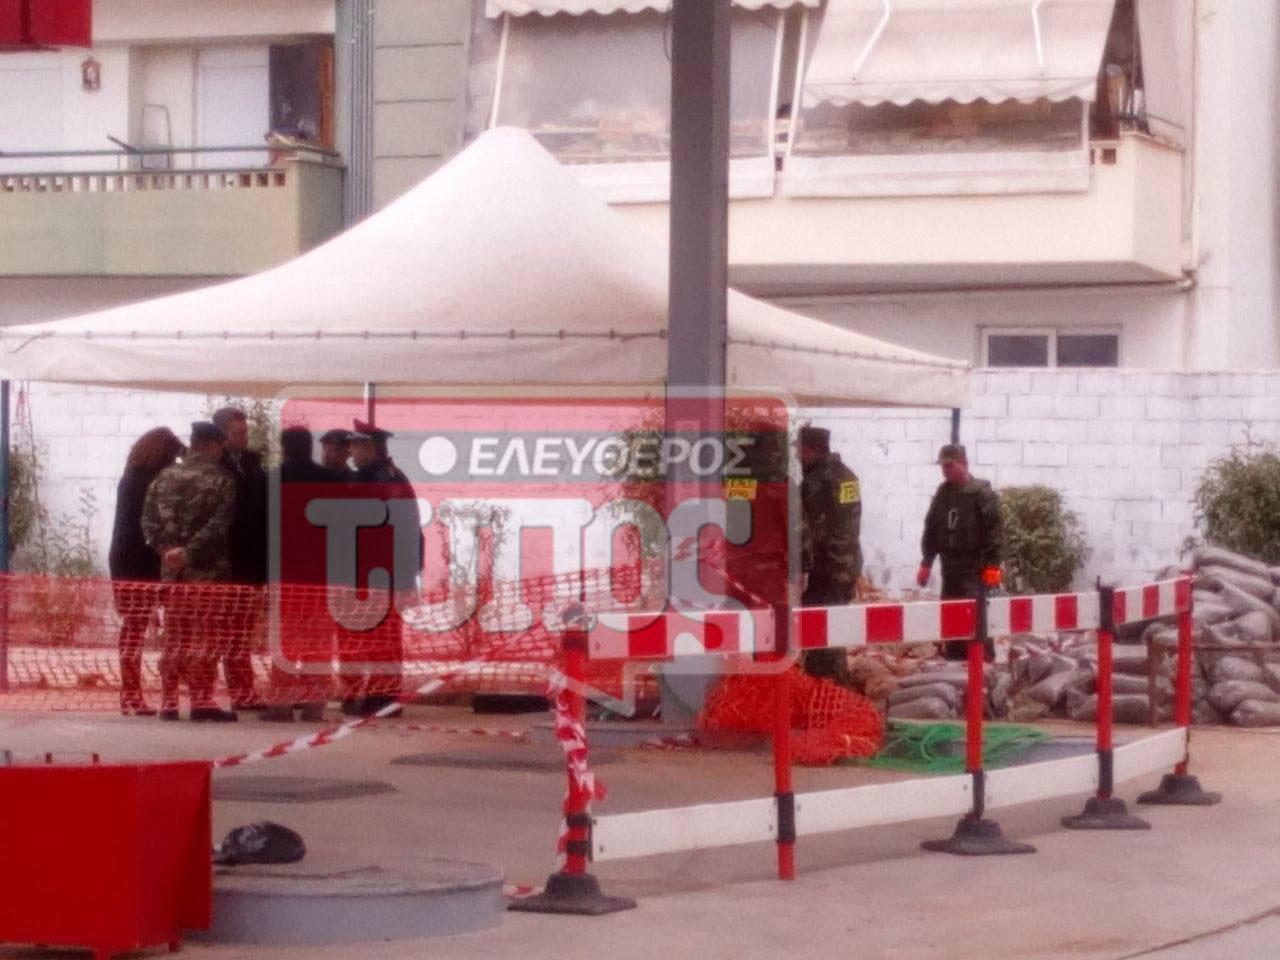 purotexnourgoi-vomva-1 Λήξη συναγερμού στο Κορδελιό - Επιστρέφουν οι κάτοικοι